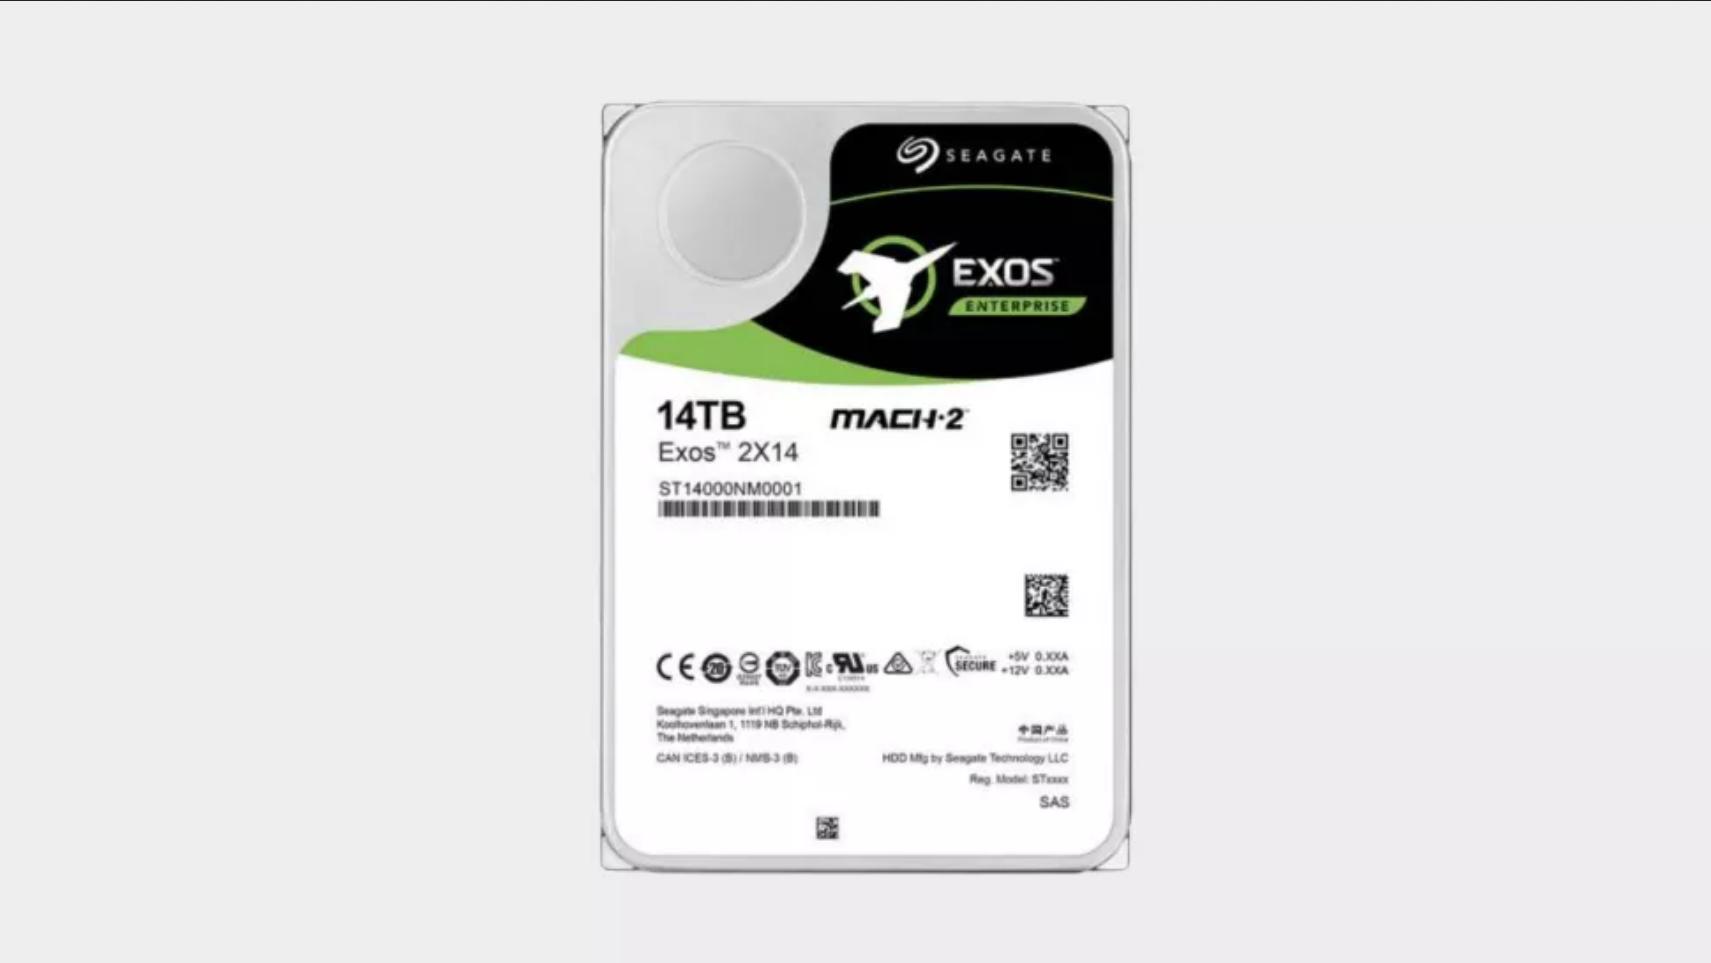 Seagate представила HDD со скоростью передачи данных близкой к SSD